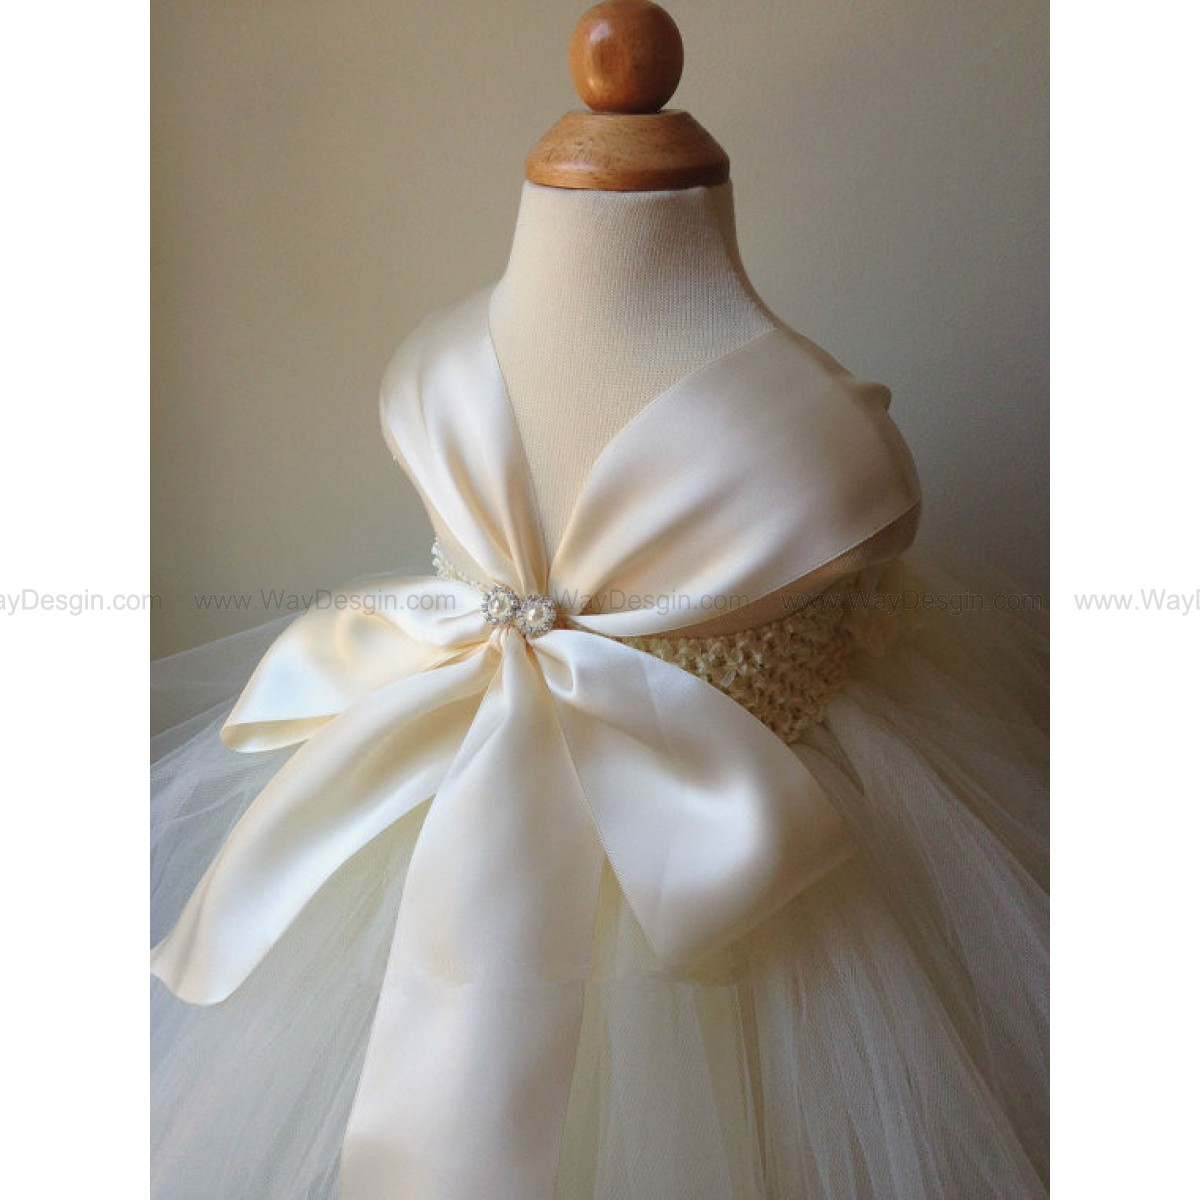 Flower girl dress tutu dress champagne, ivory chiffton roses, baby tutu dress, toddler tutu dress,newborn